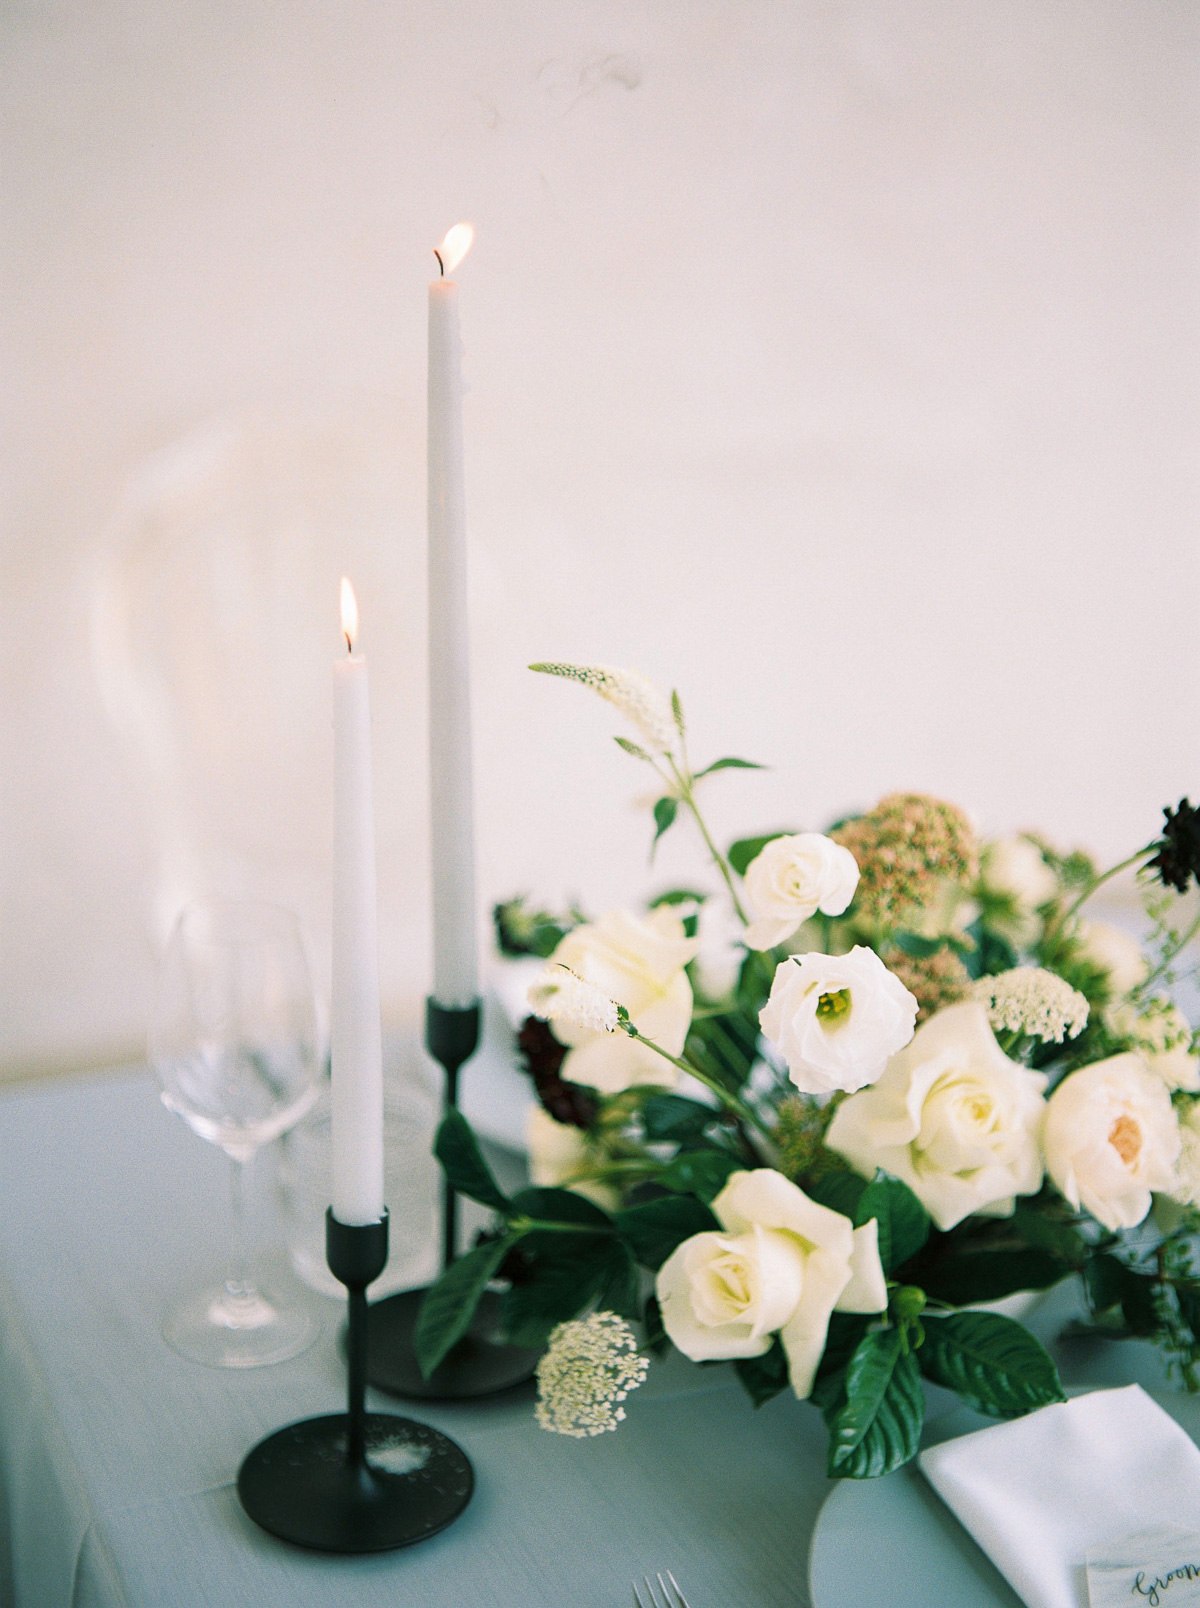 kurtz-orpia-photography-vineyard-bride-swish-list-dundurn-castle-dundas-wedding-editorial-35.jpg